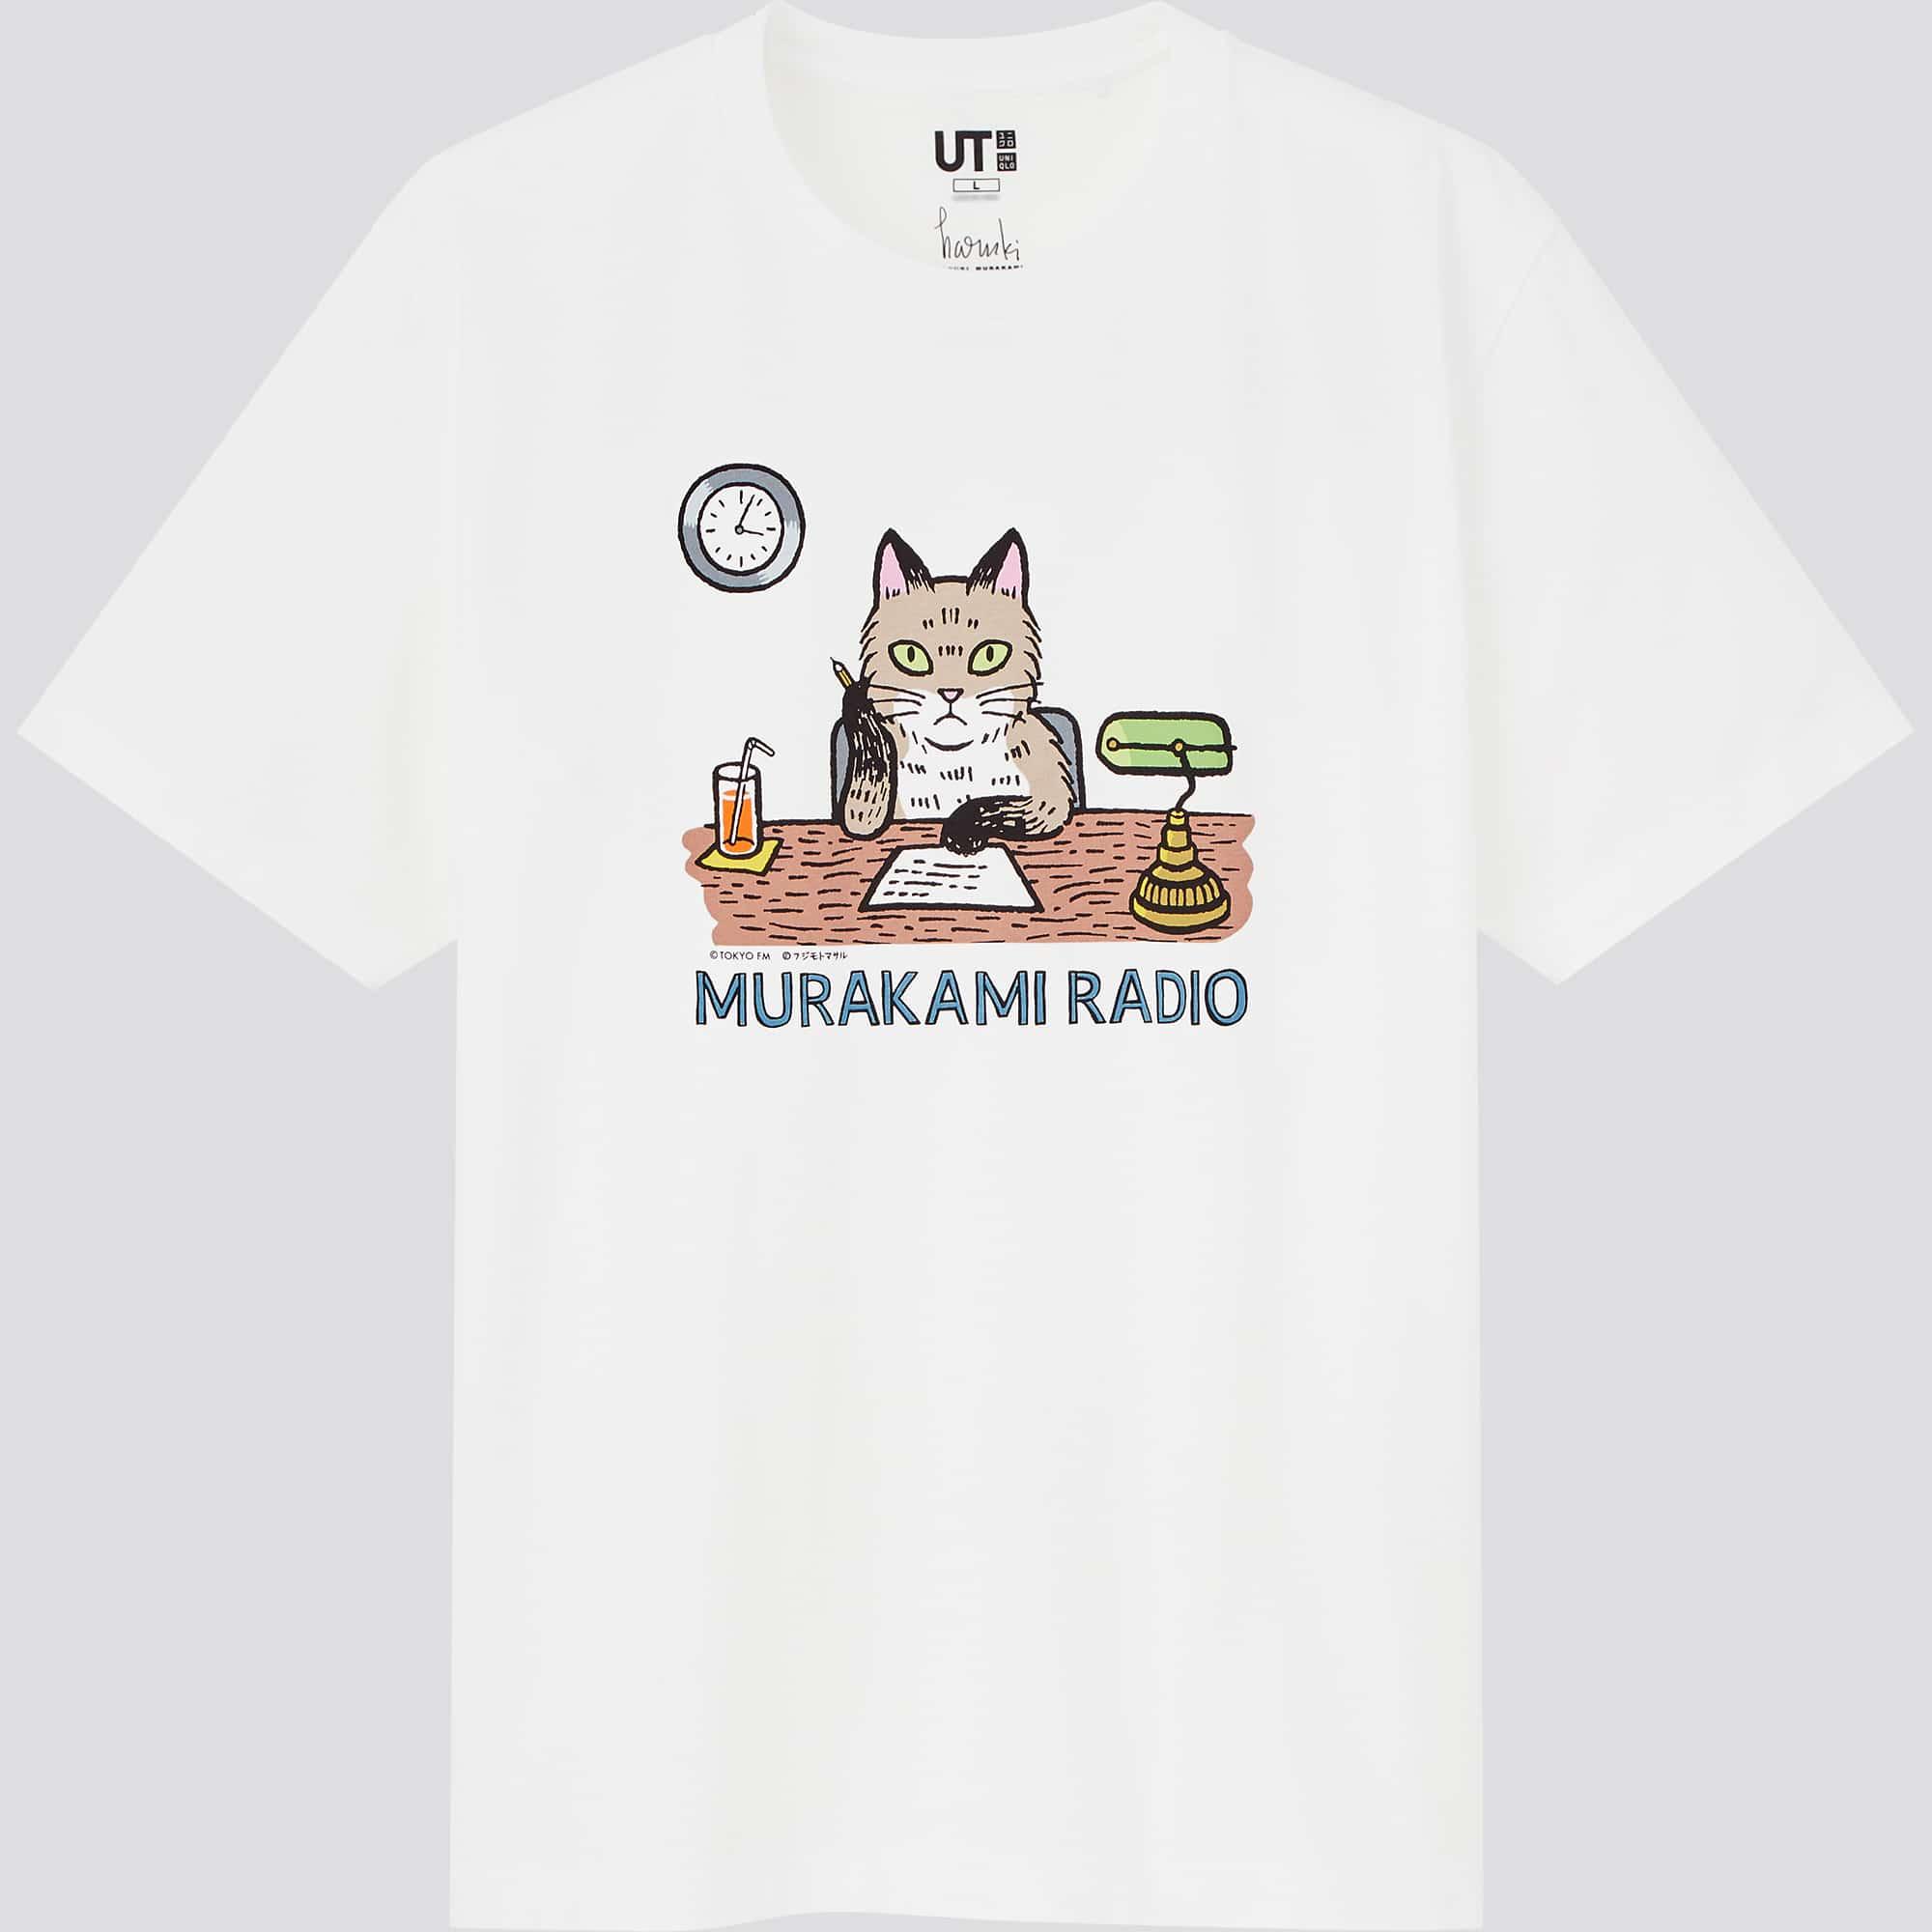 Uniqlo brings the creative world of Haruki Murakami to its new UT collection 18